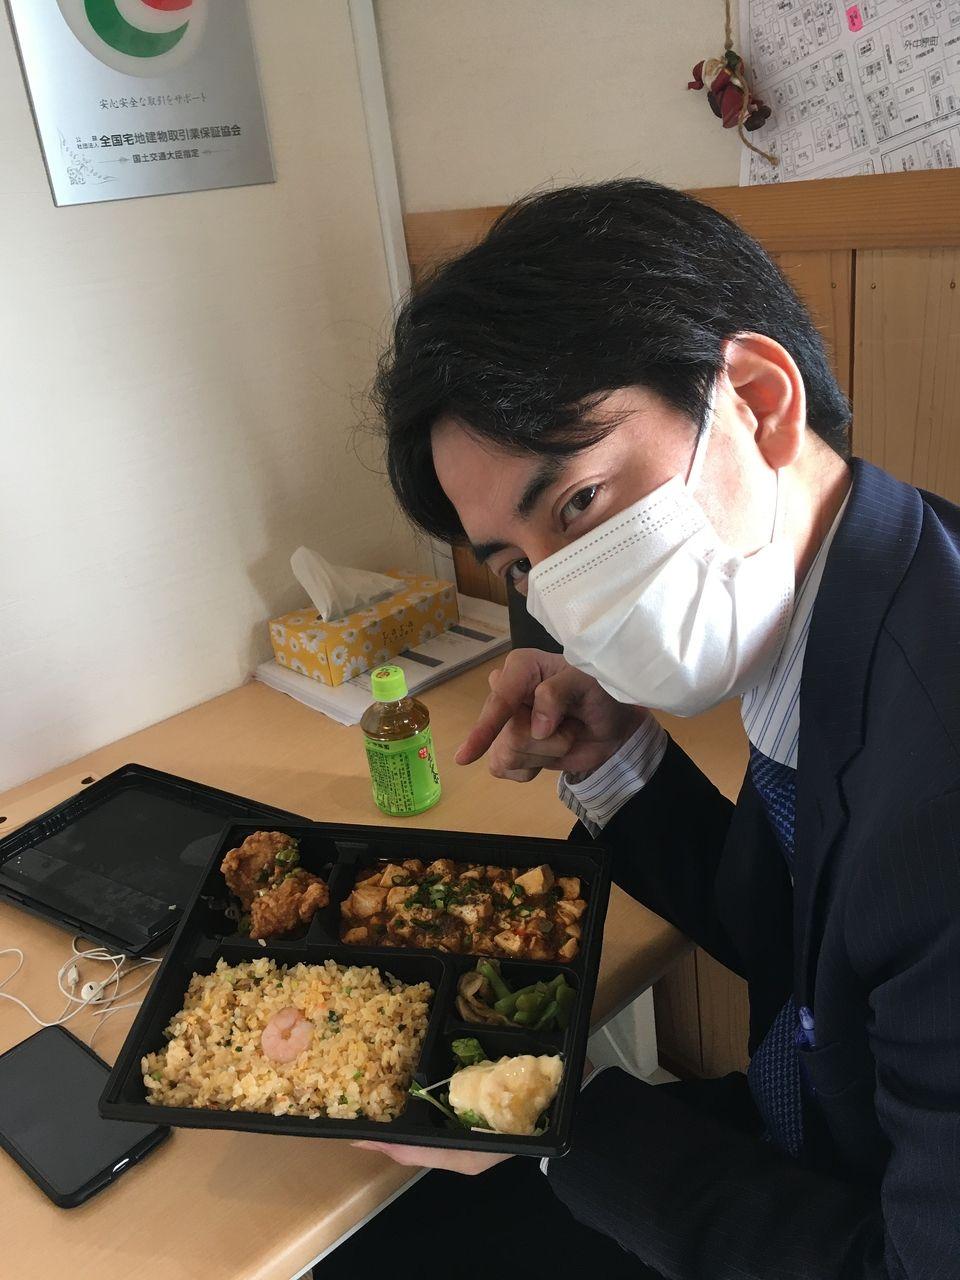 《TAKEOUT》松江市「桃仙閣」のお弁当